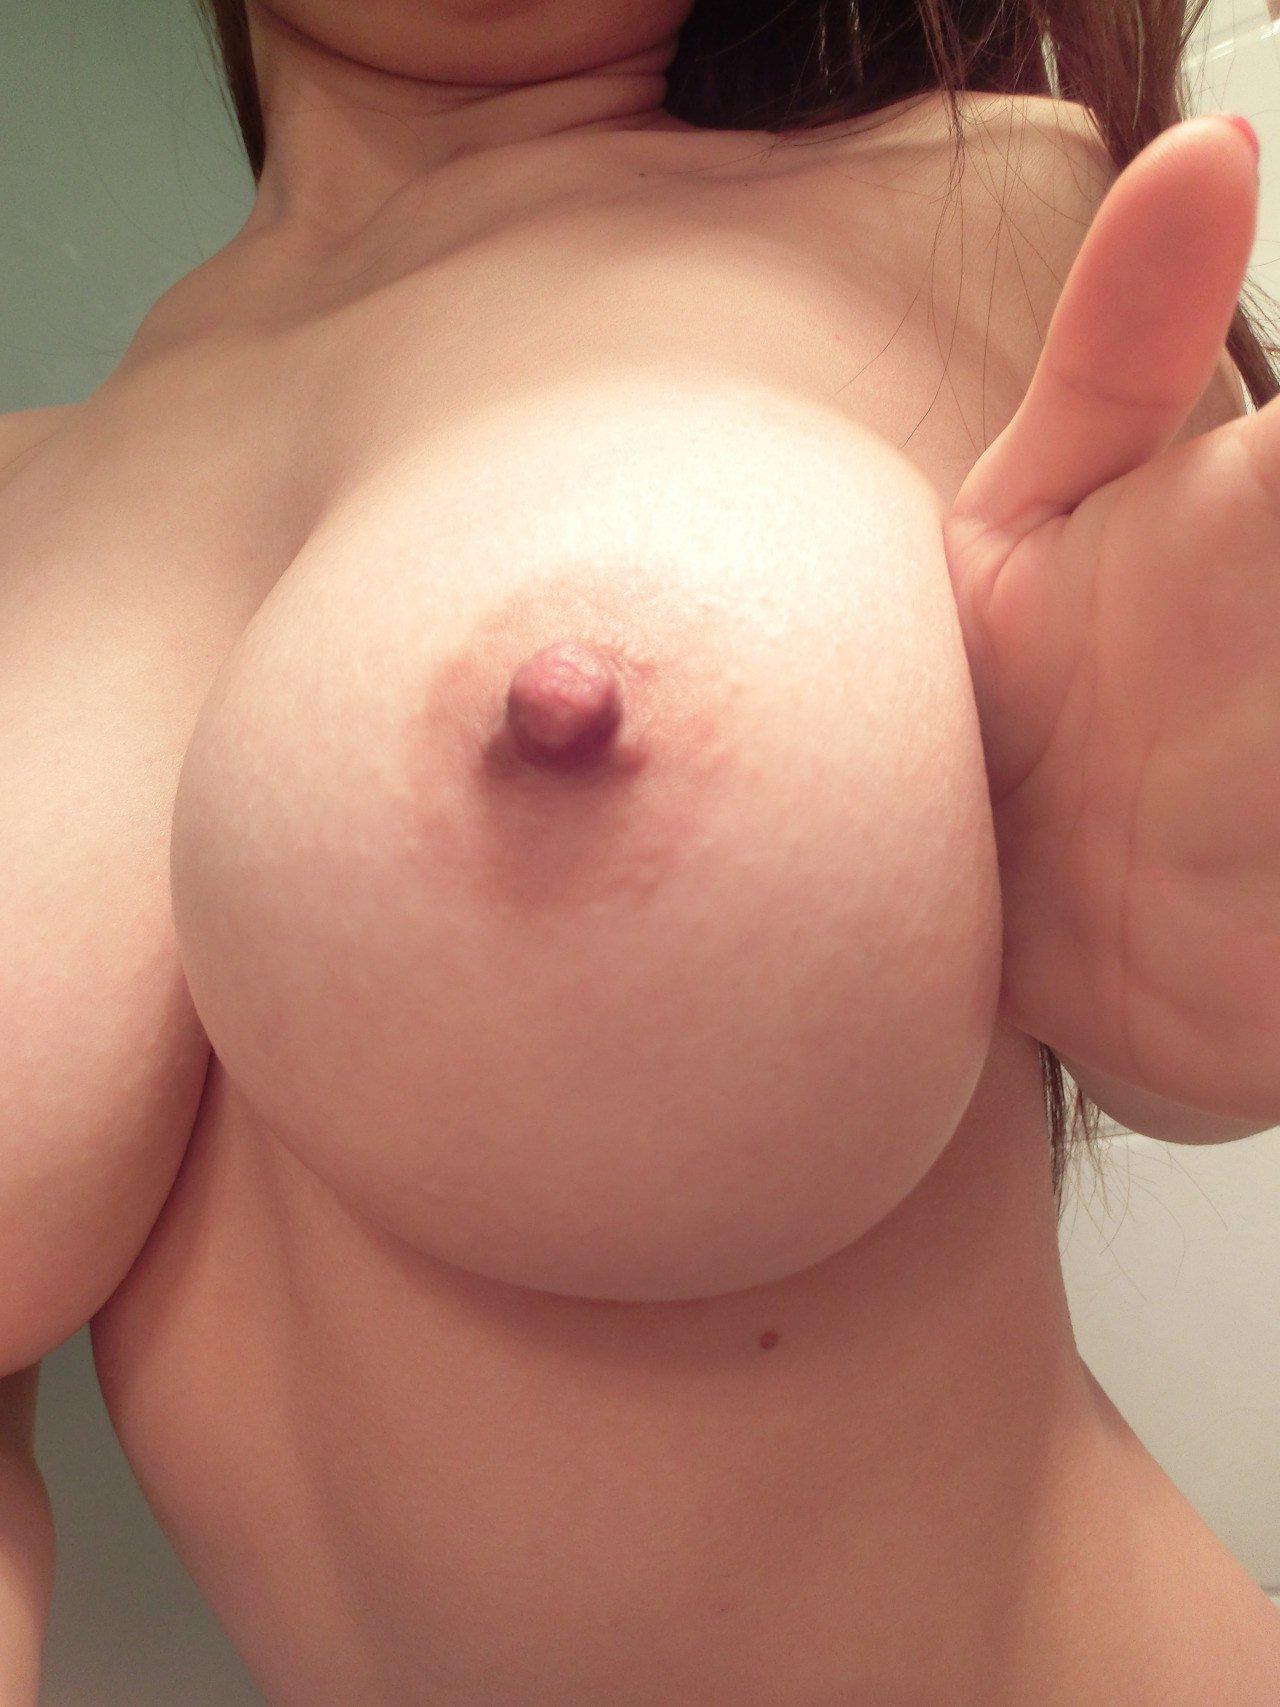 the eiffel tower sex act tag team porn pictures #bigboobs #bignaturals #bodacious #closetocum #cougar #hardnipples #hornyslut #largenipples #longnipples #masturbating #naturalboobs #openmouth #pendulous